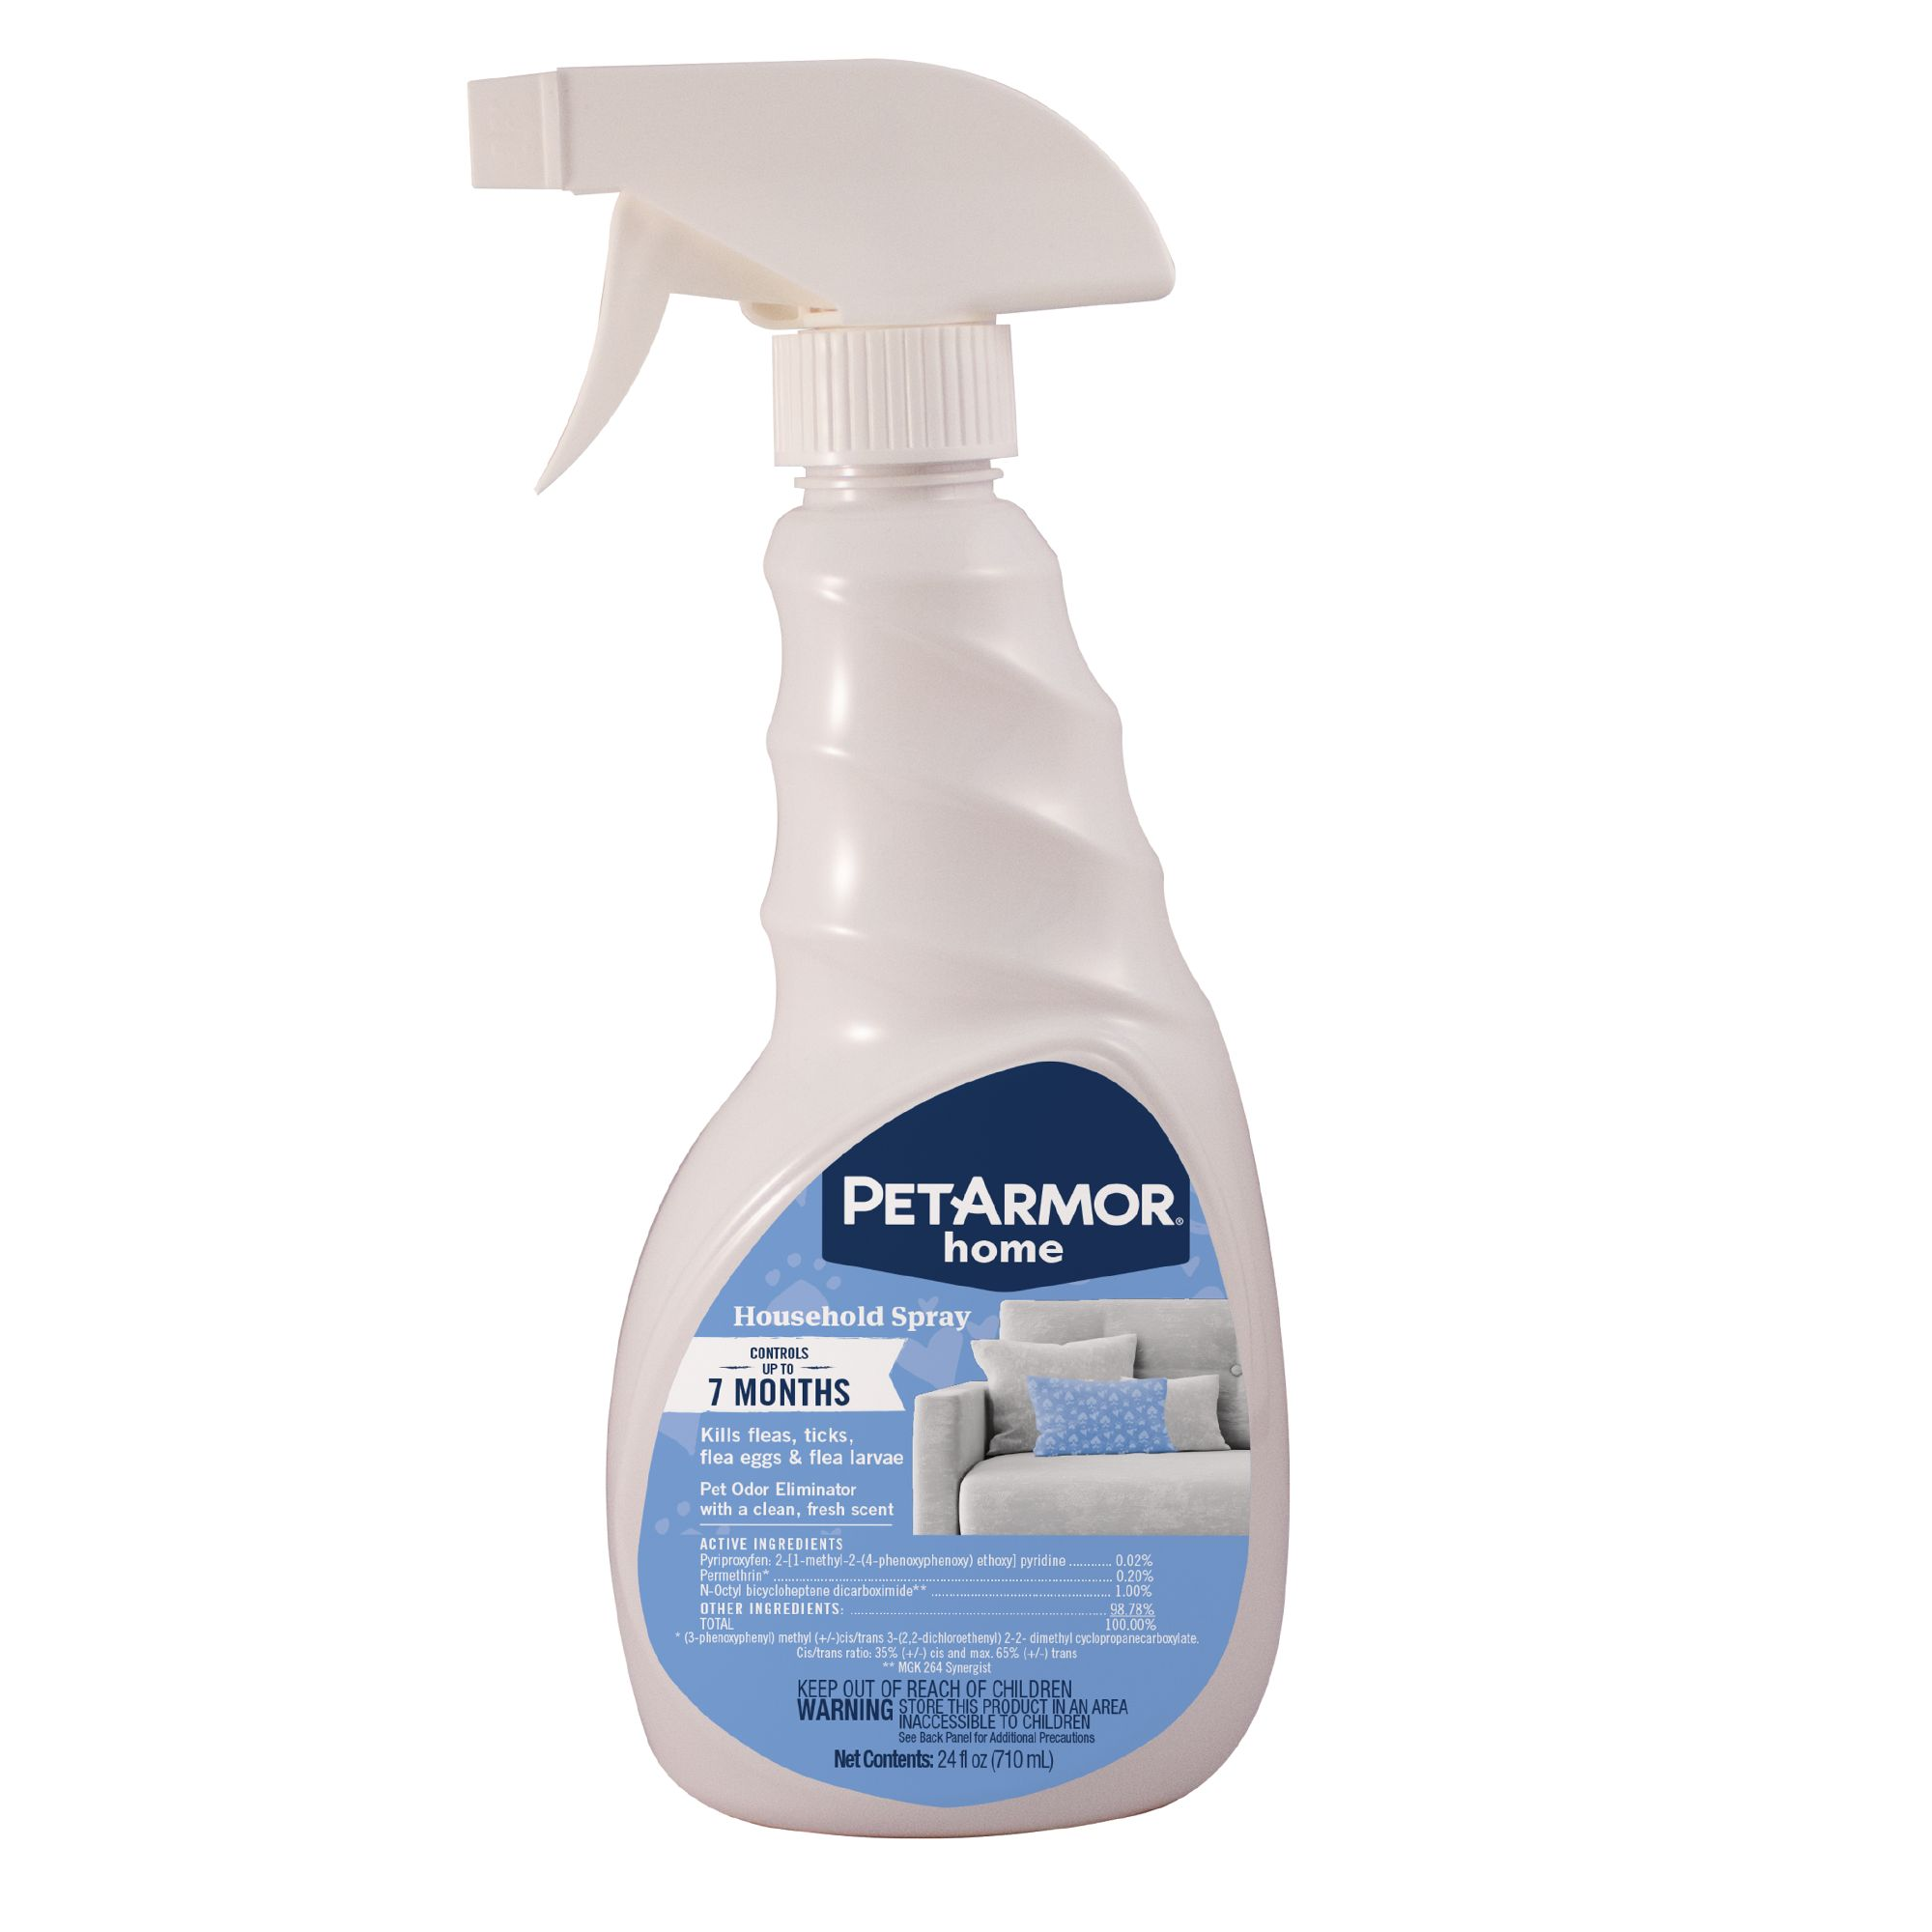 PetArmor Flea and Tick Household Spray